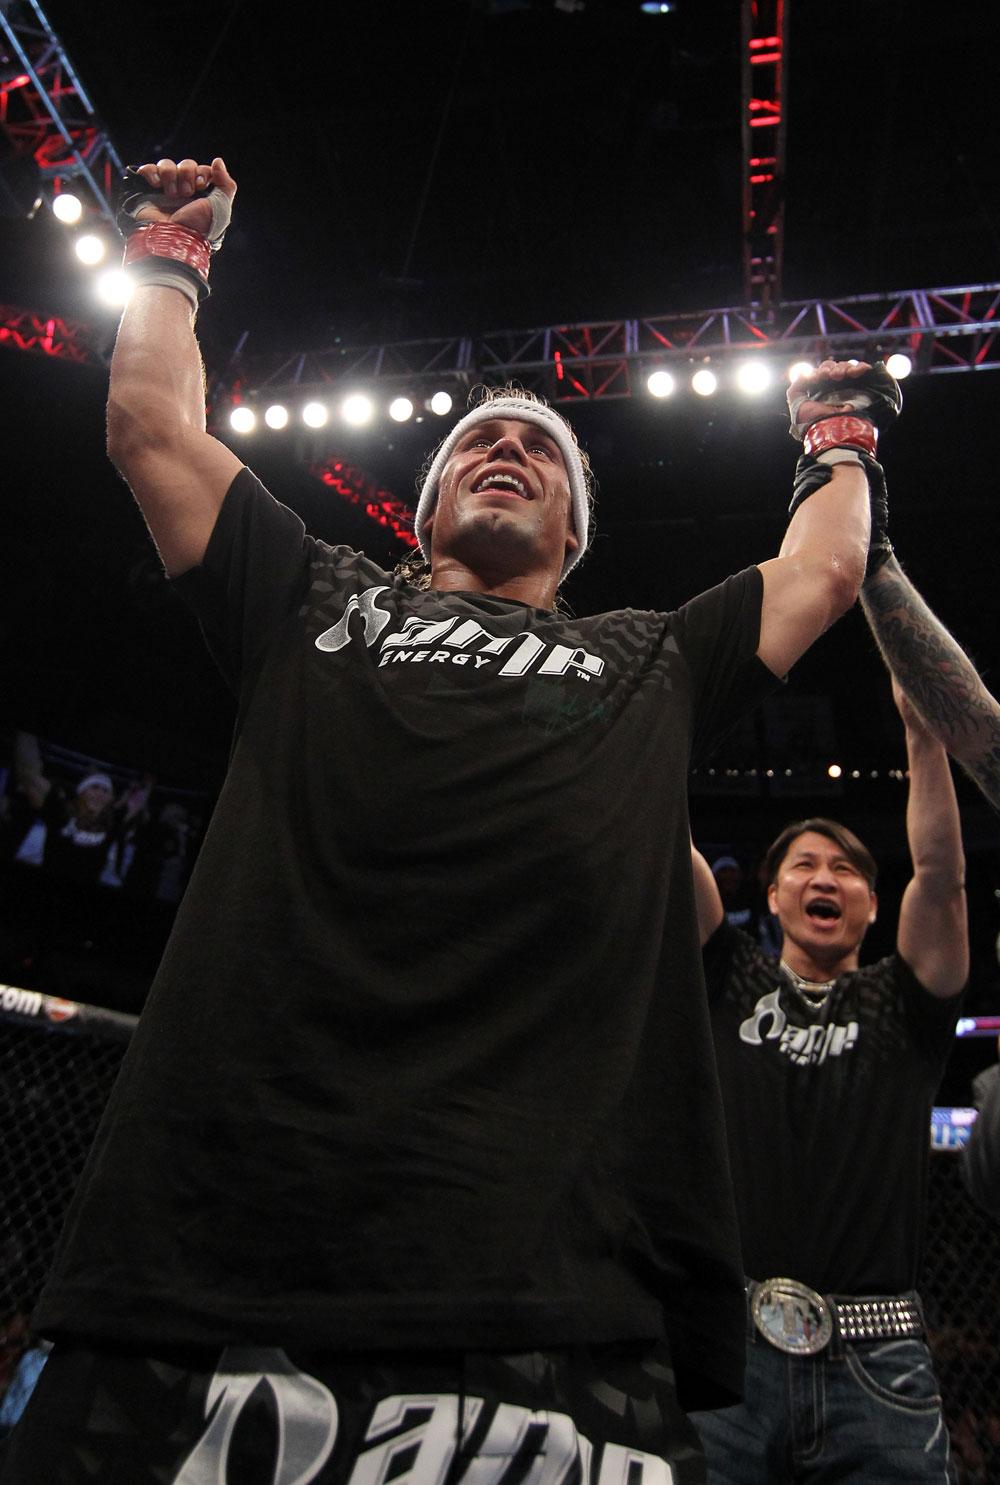 UFC 128: Urijah Faber celebrates his win